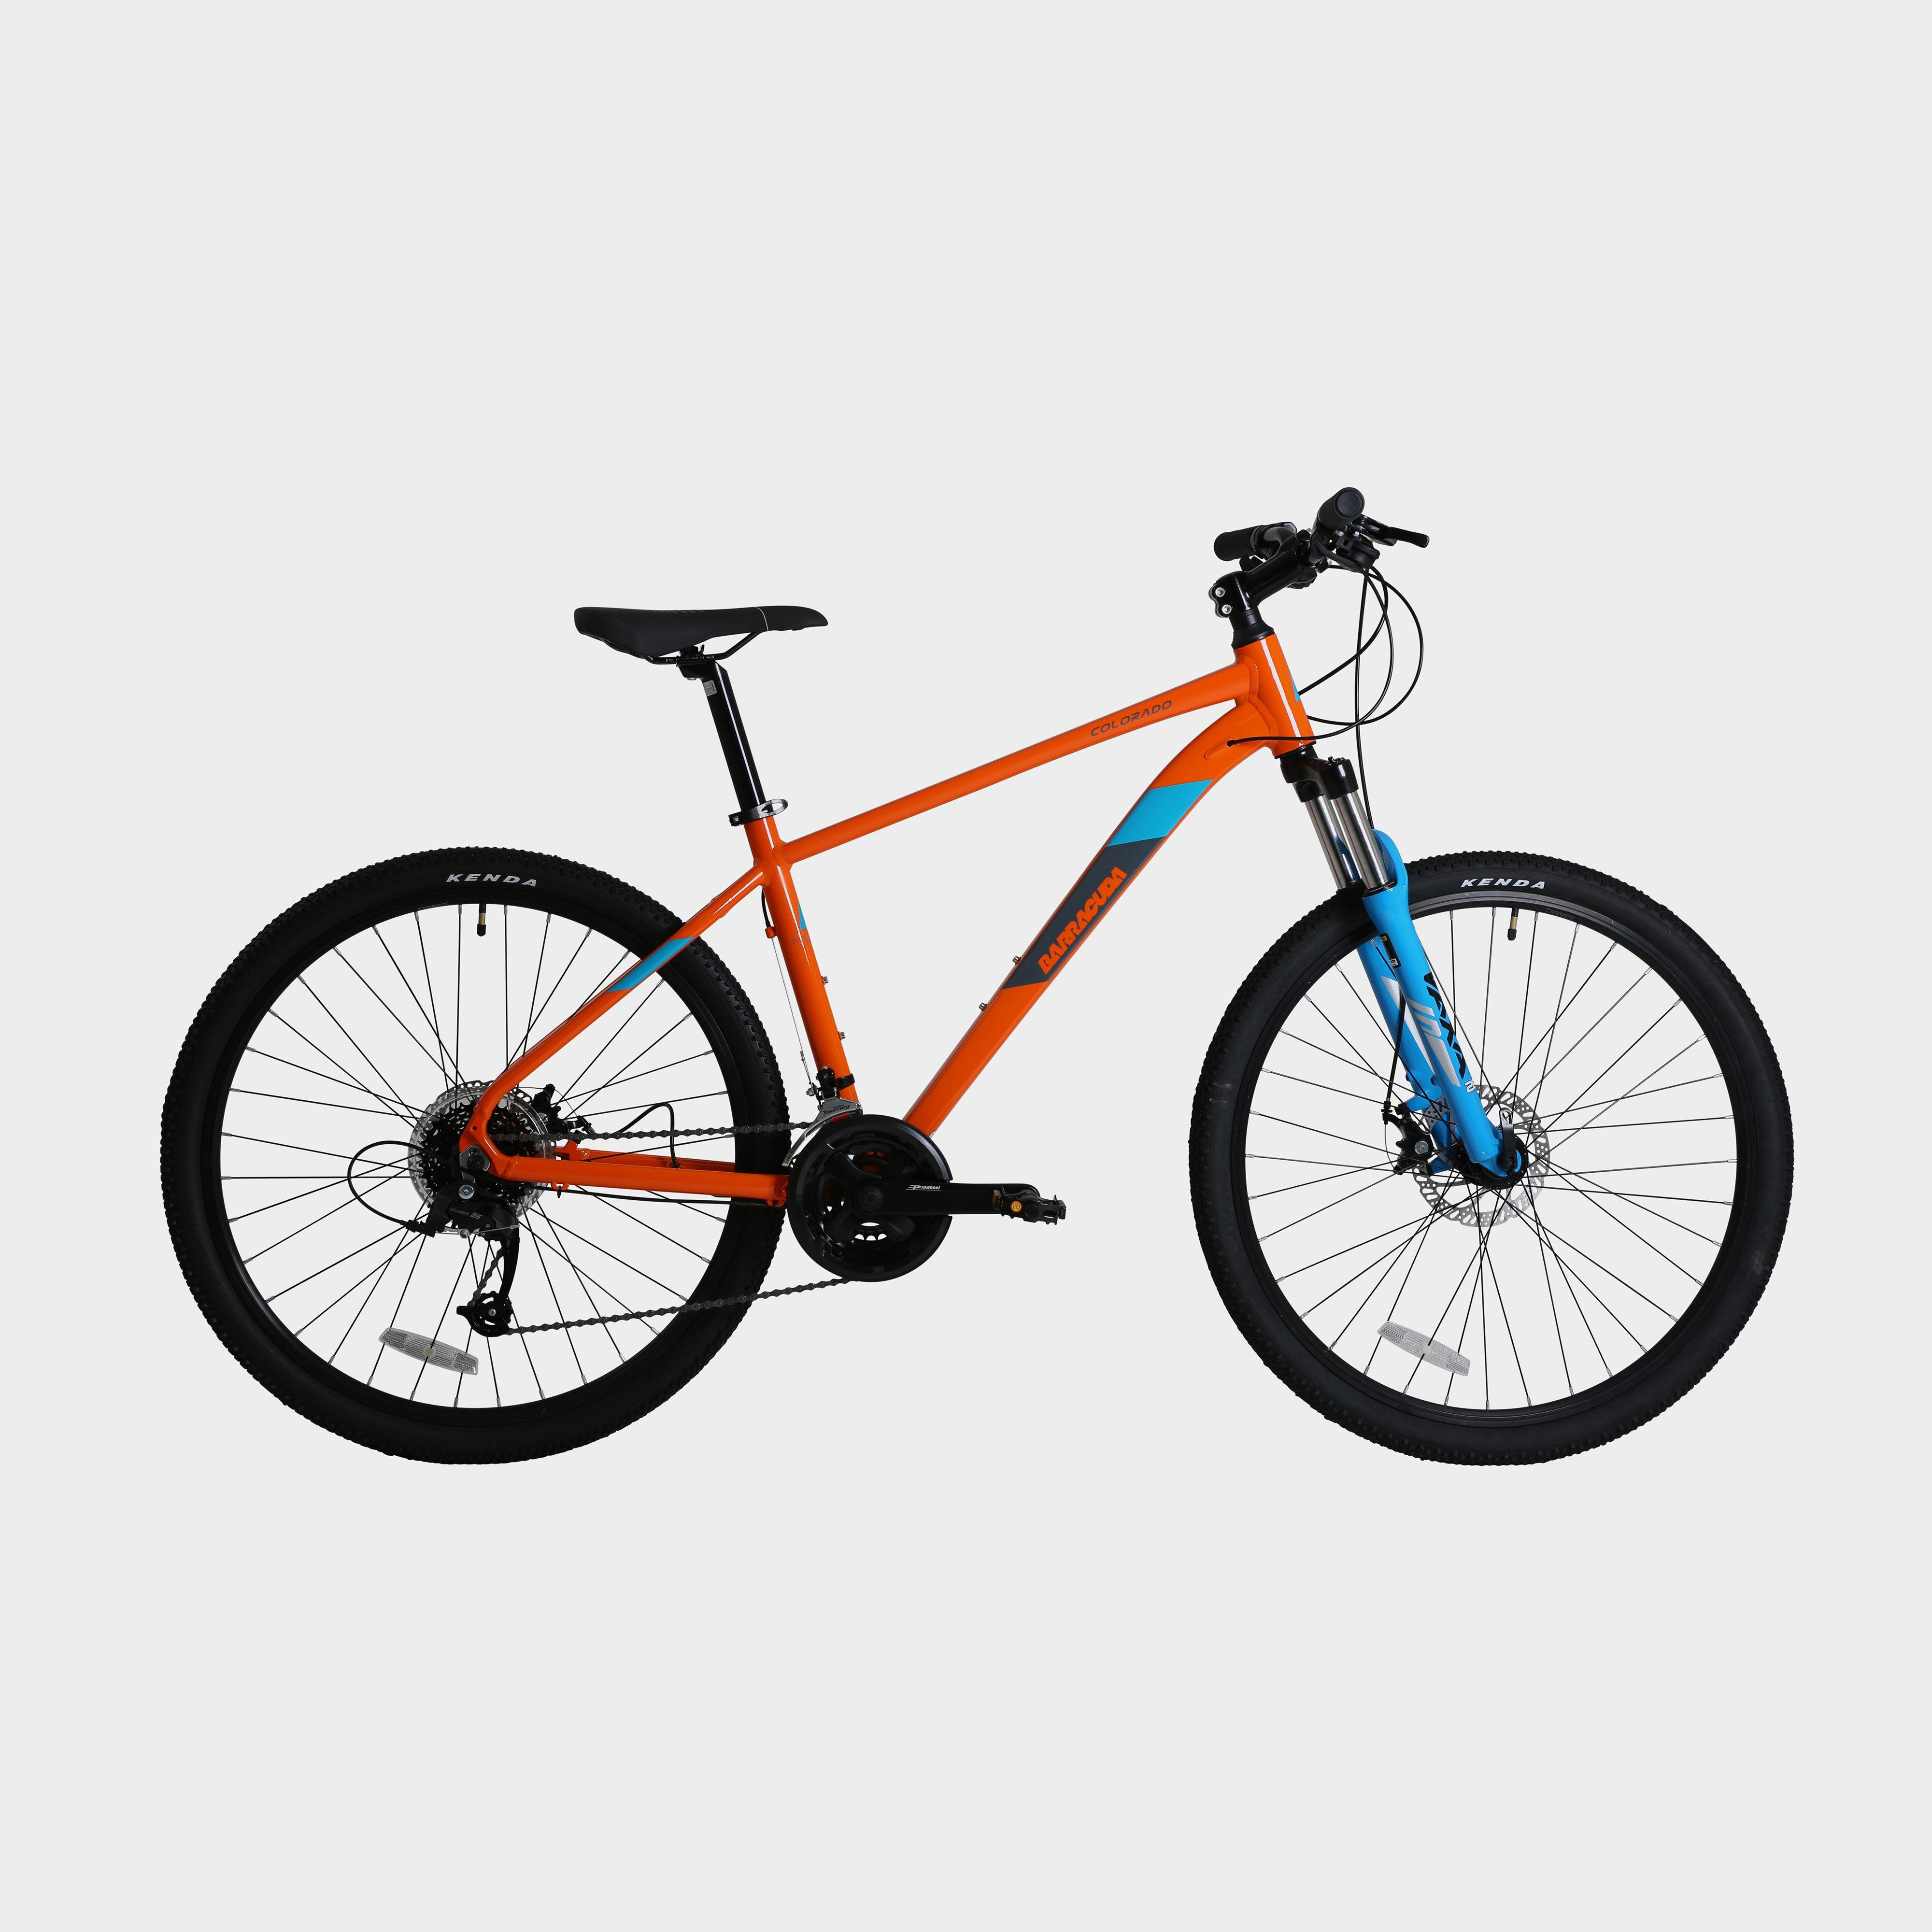 "Barracuda Colorado Men's 17.5"" Hard-Tail Bike - Orange/Orange, Orange"